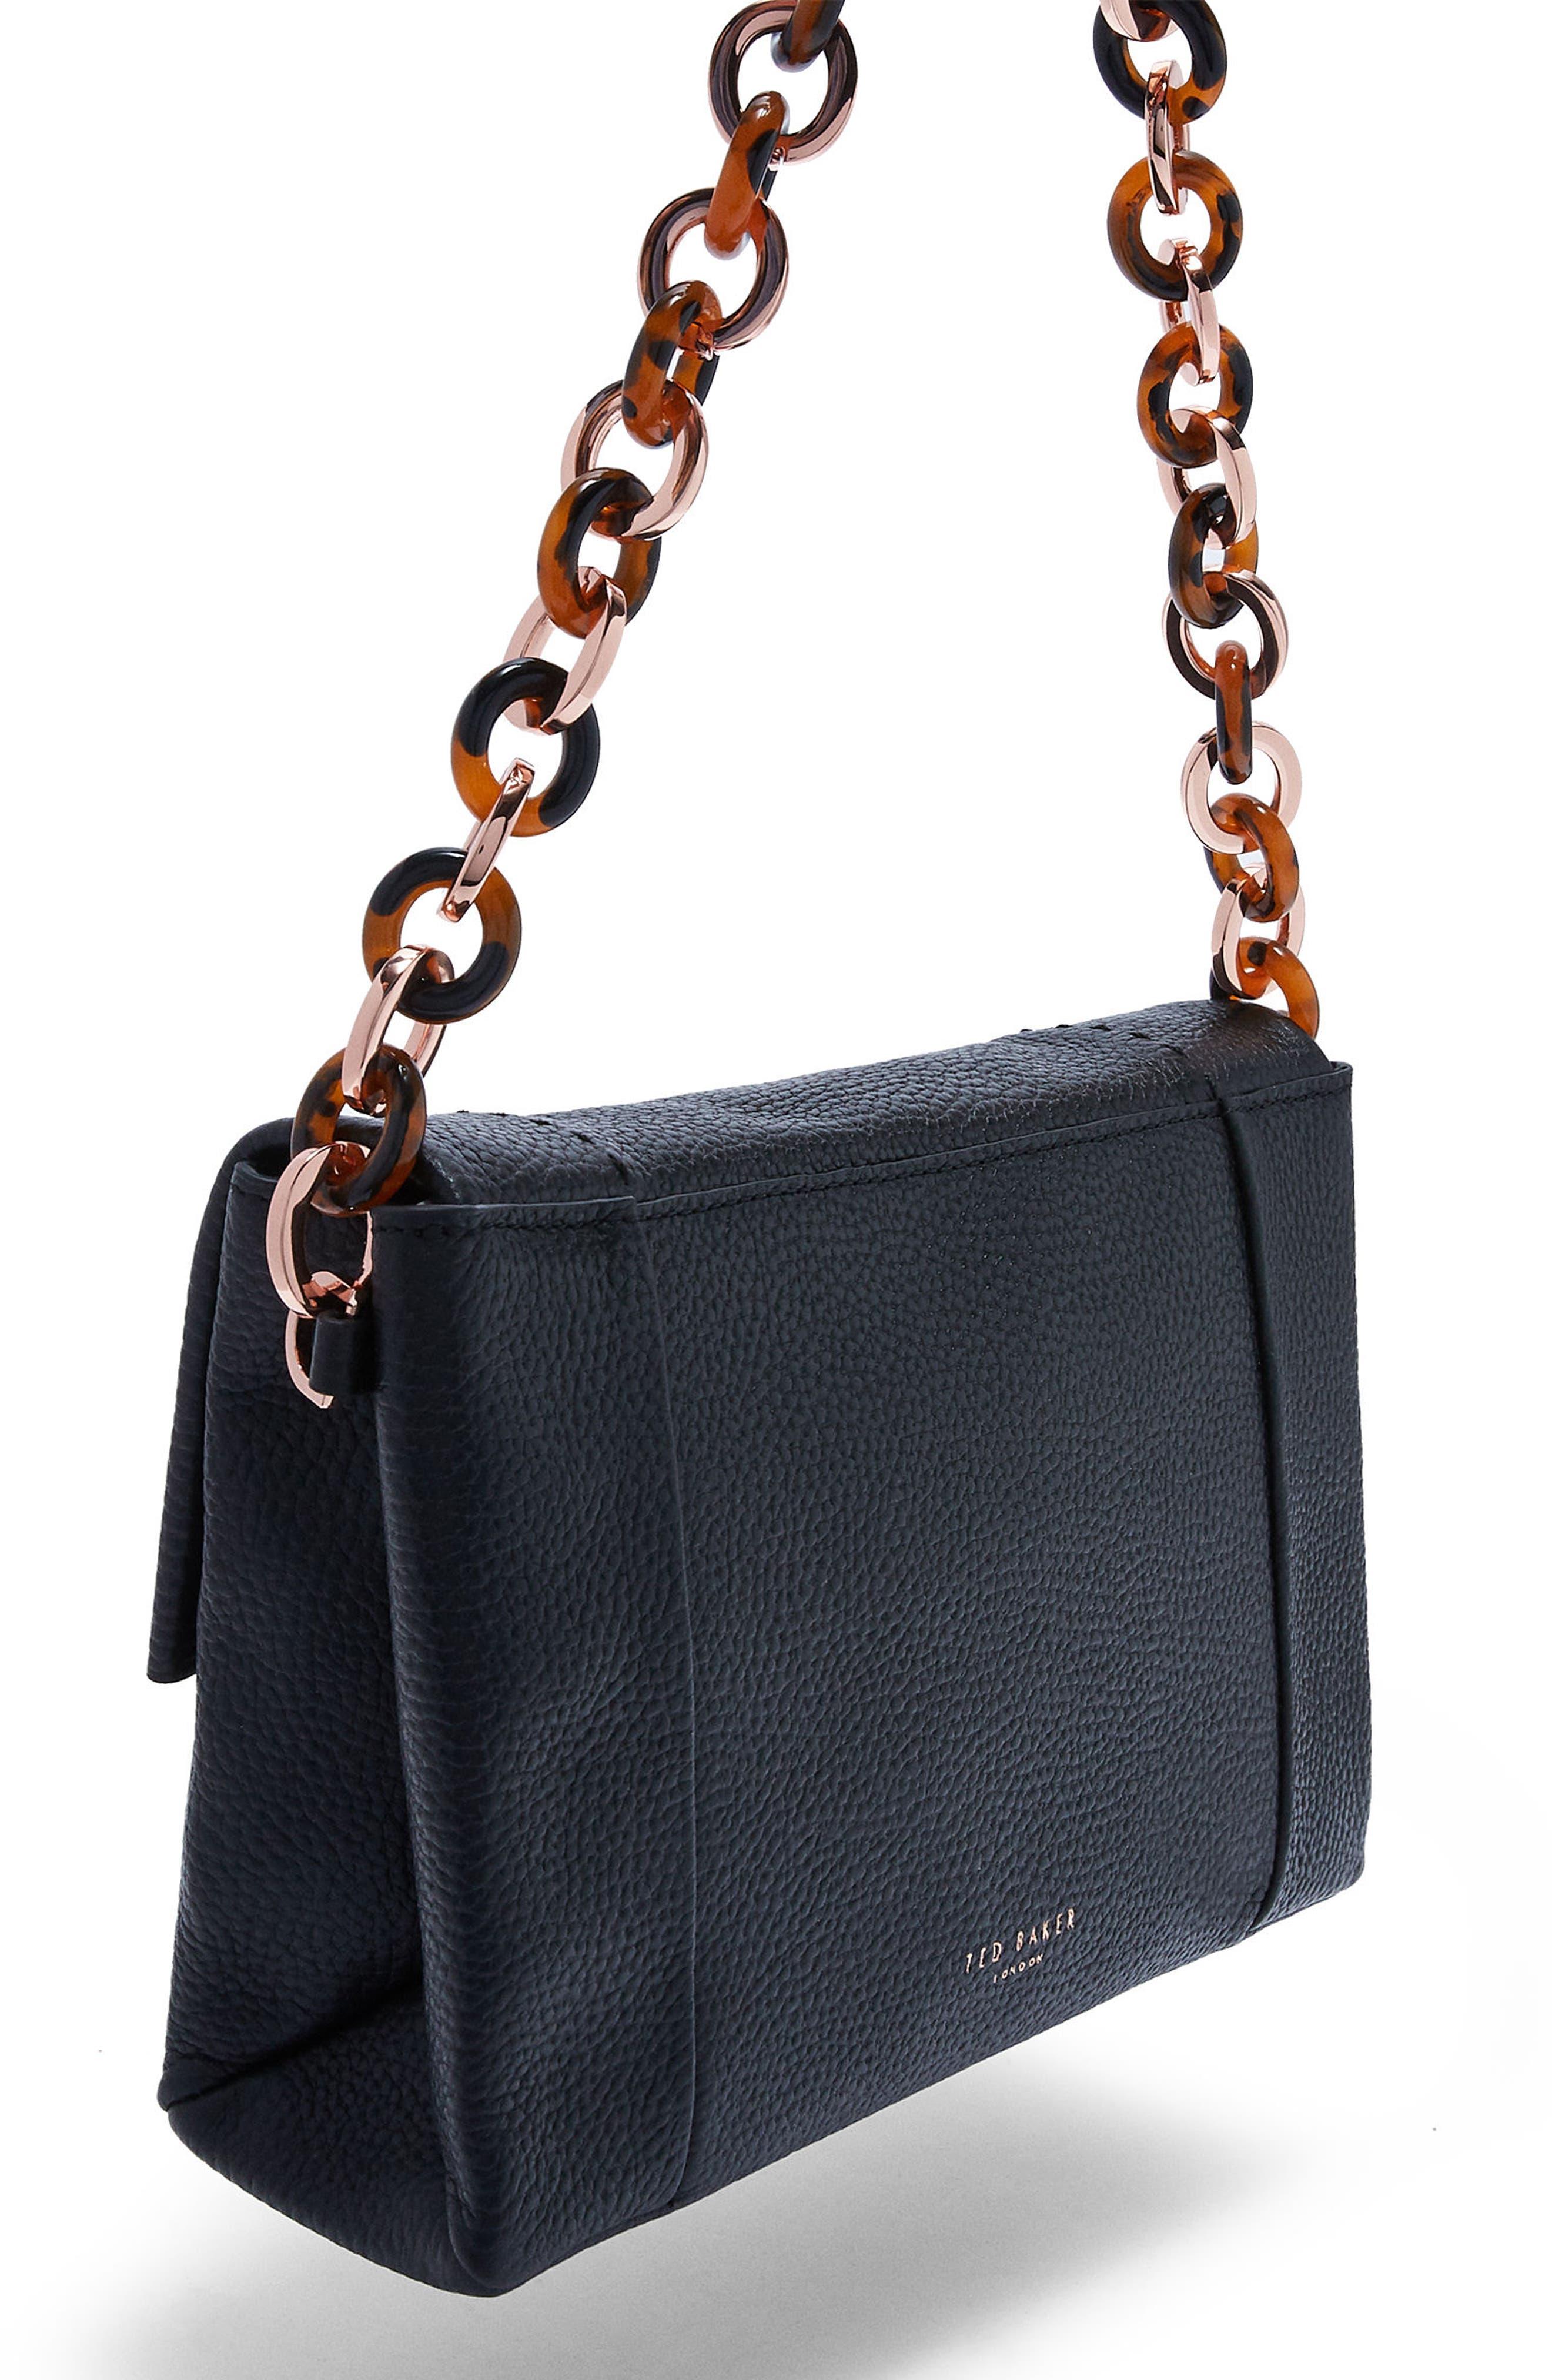 Ipomoea Leather Shoulder Bag,                             Alternate thumbnail 2, color,                             001